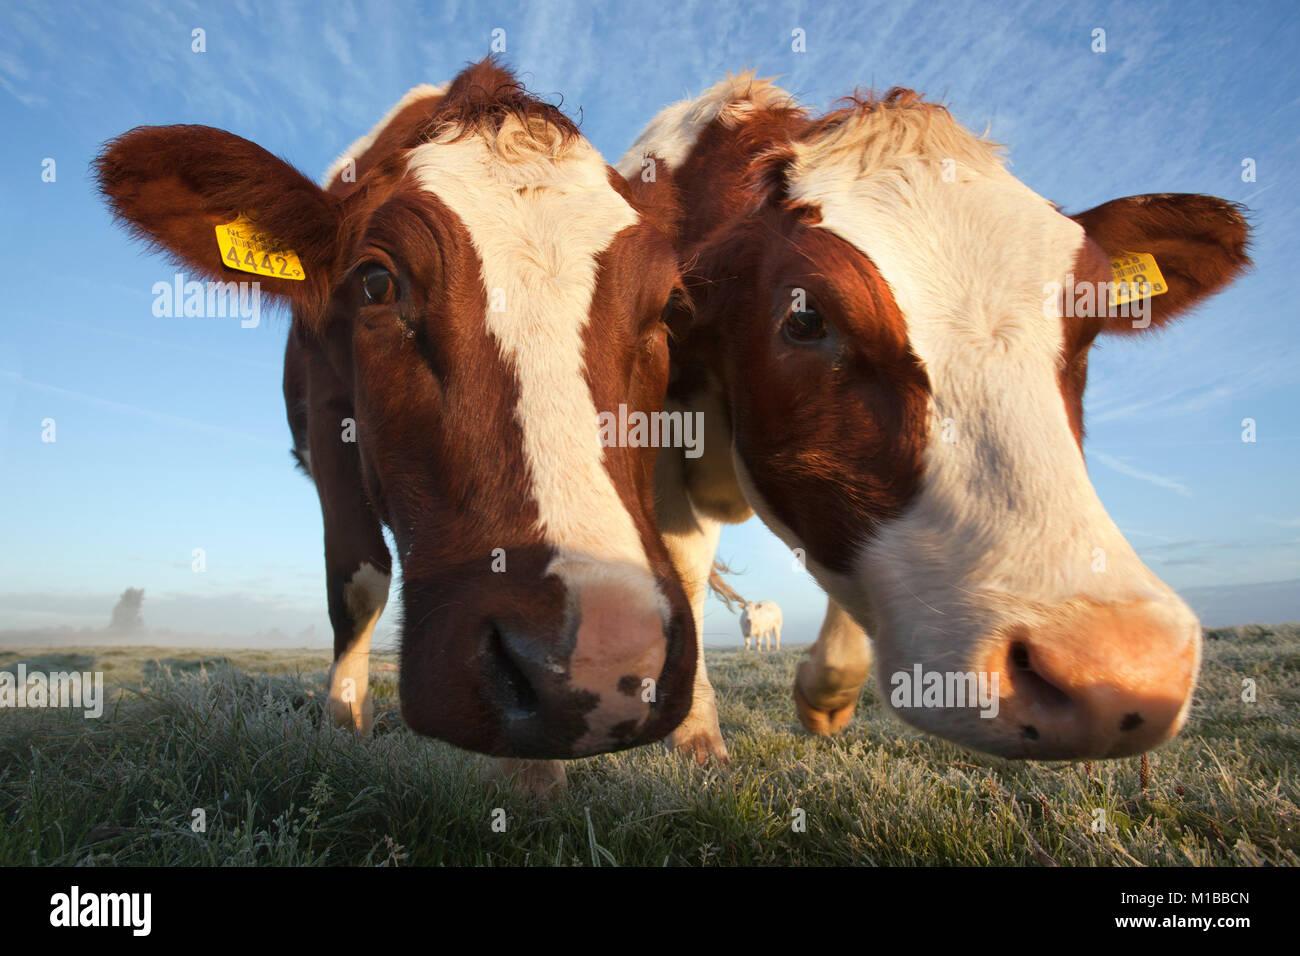 The Netherlands, Nederhorst den Berg. Cows. - Stock Image